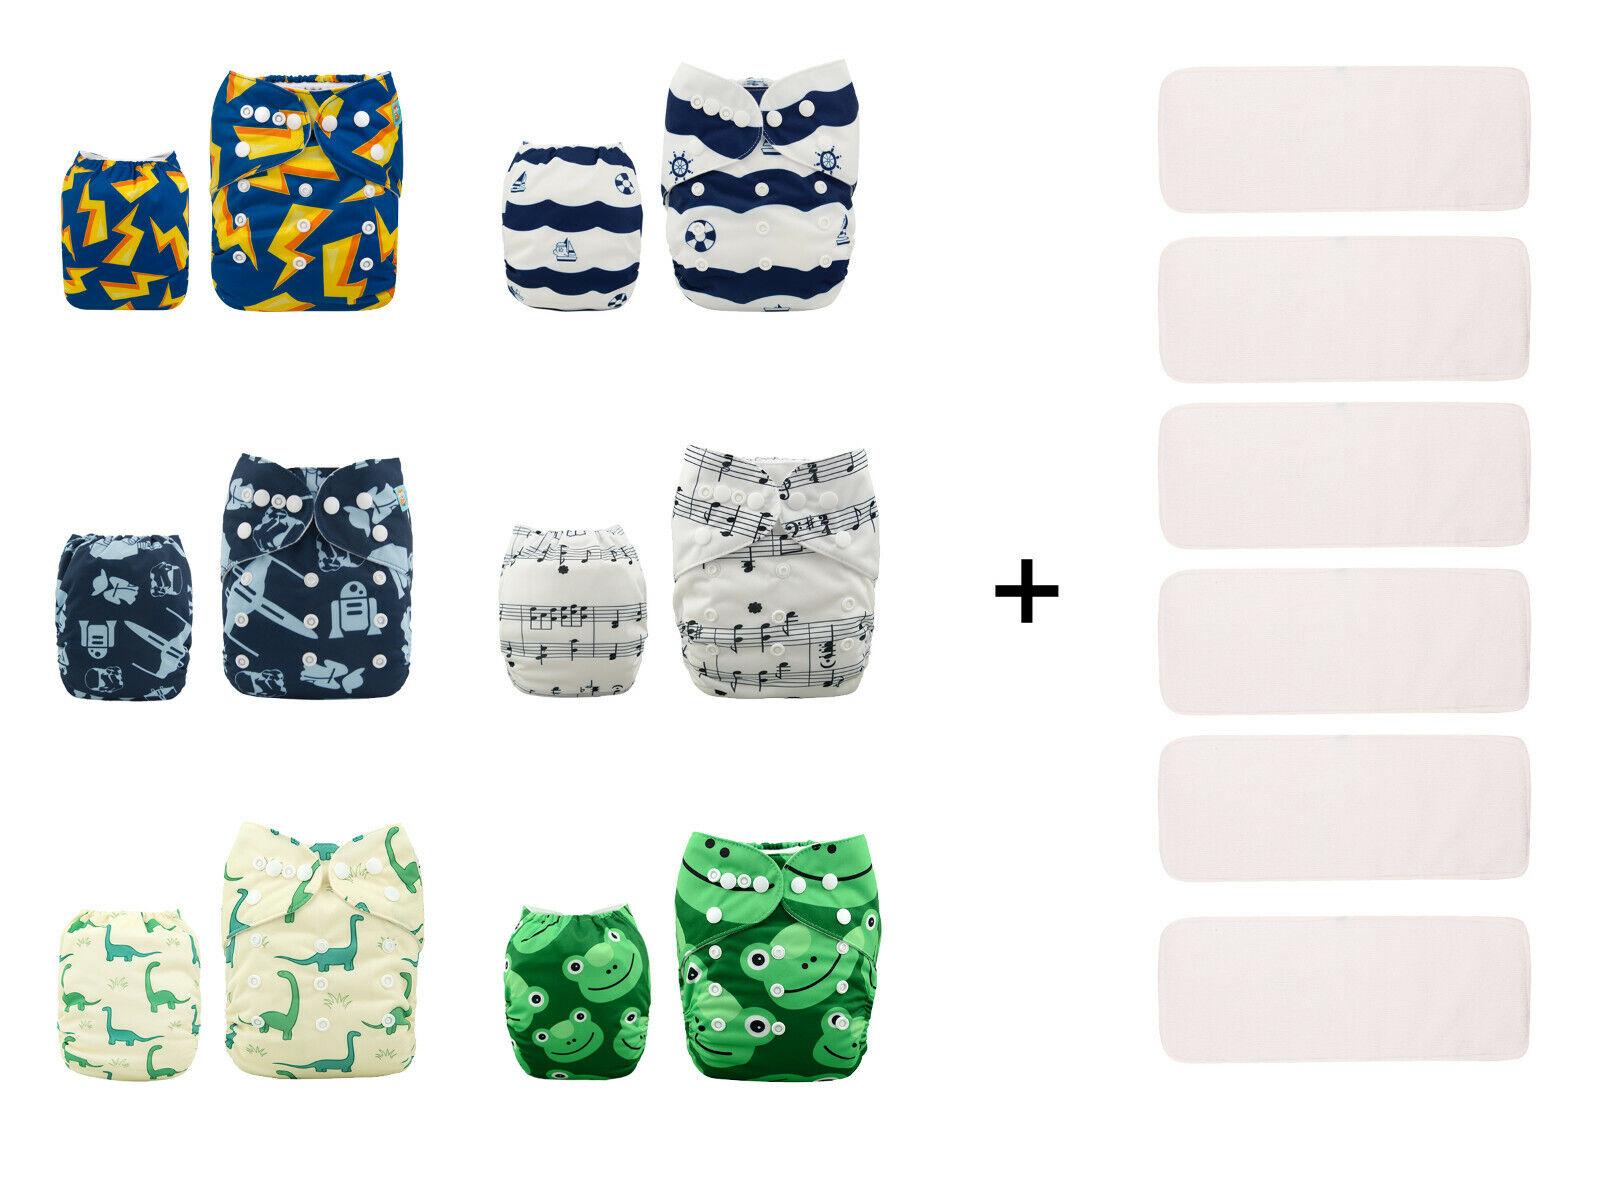 6 ALVA Baby Reusable Cloth Diapers Washable Pocket Nappies+